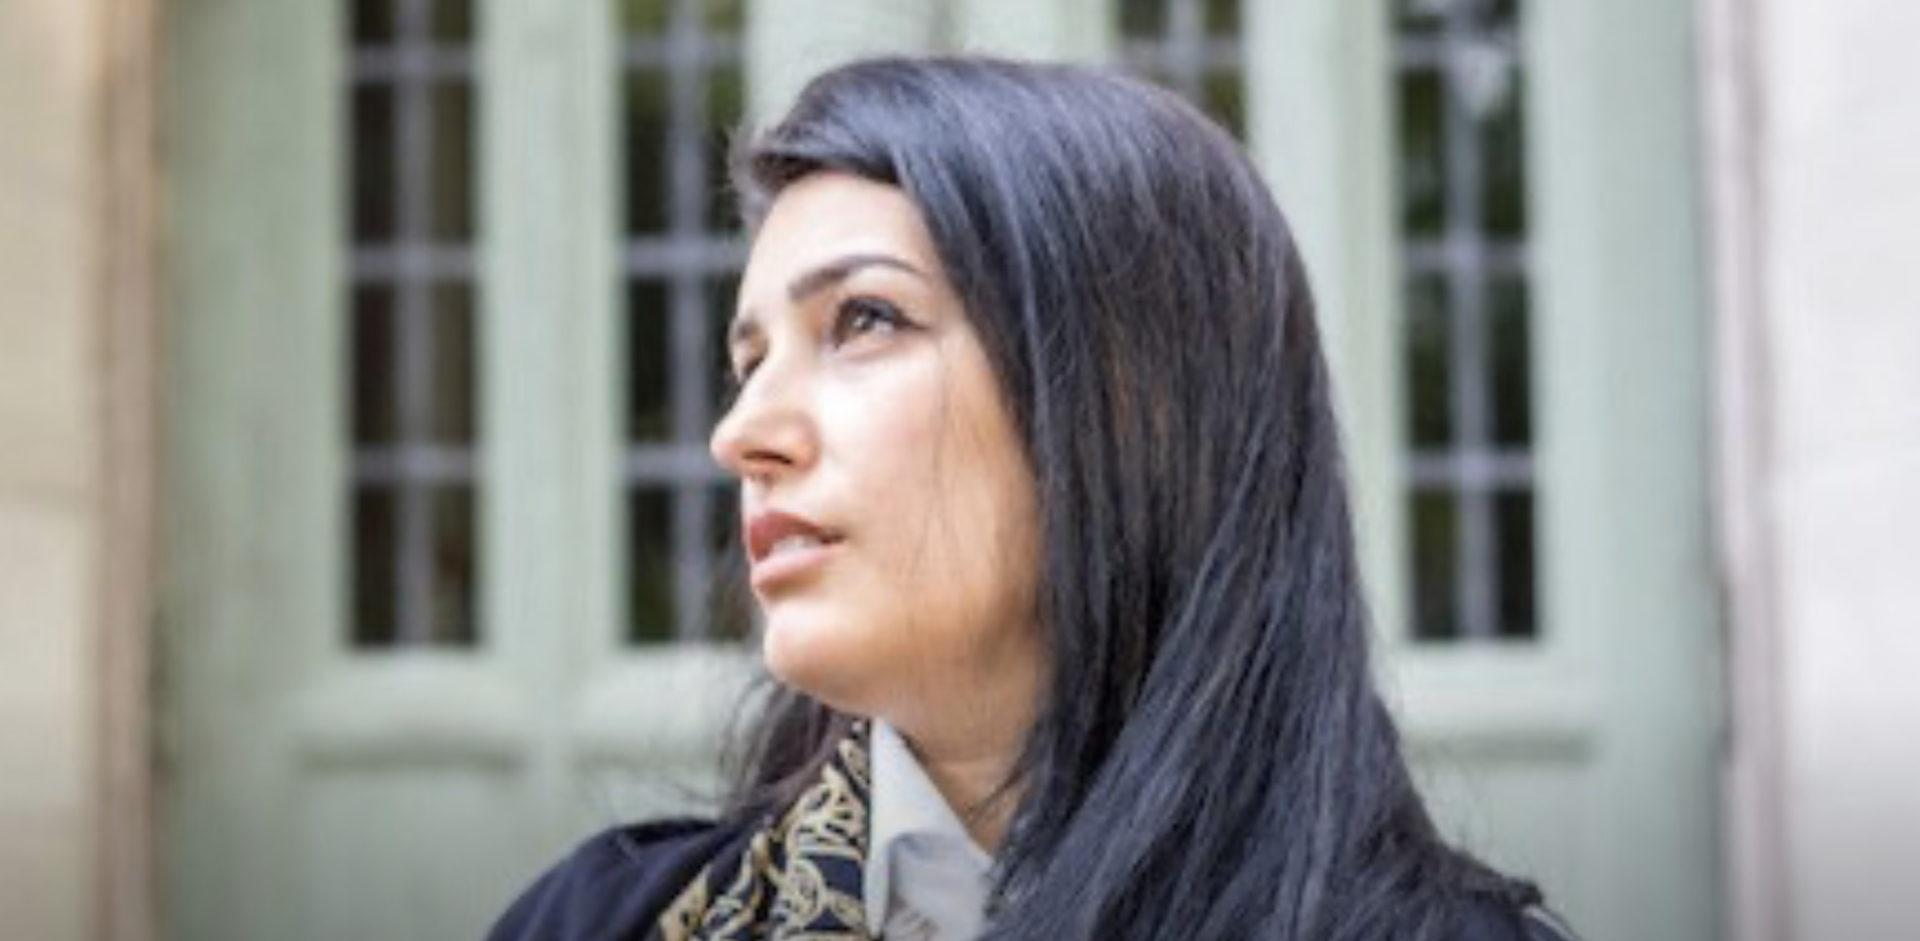 'Unbelievable': Refugee Publishes Her Autobiography About Surviving War